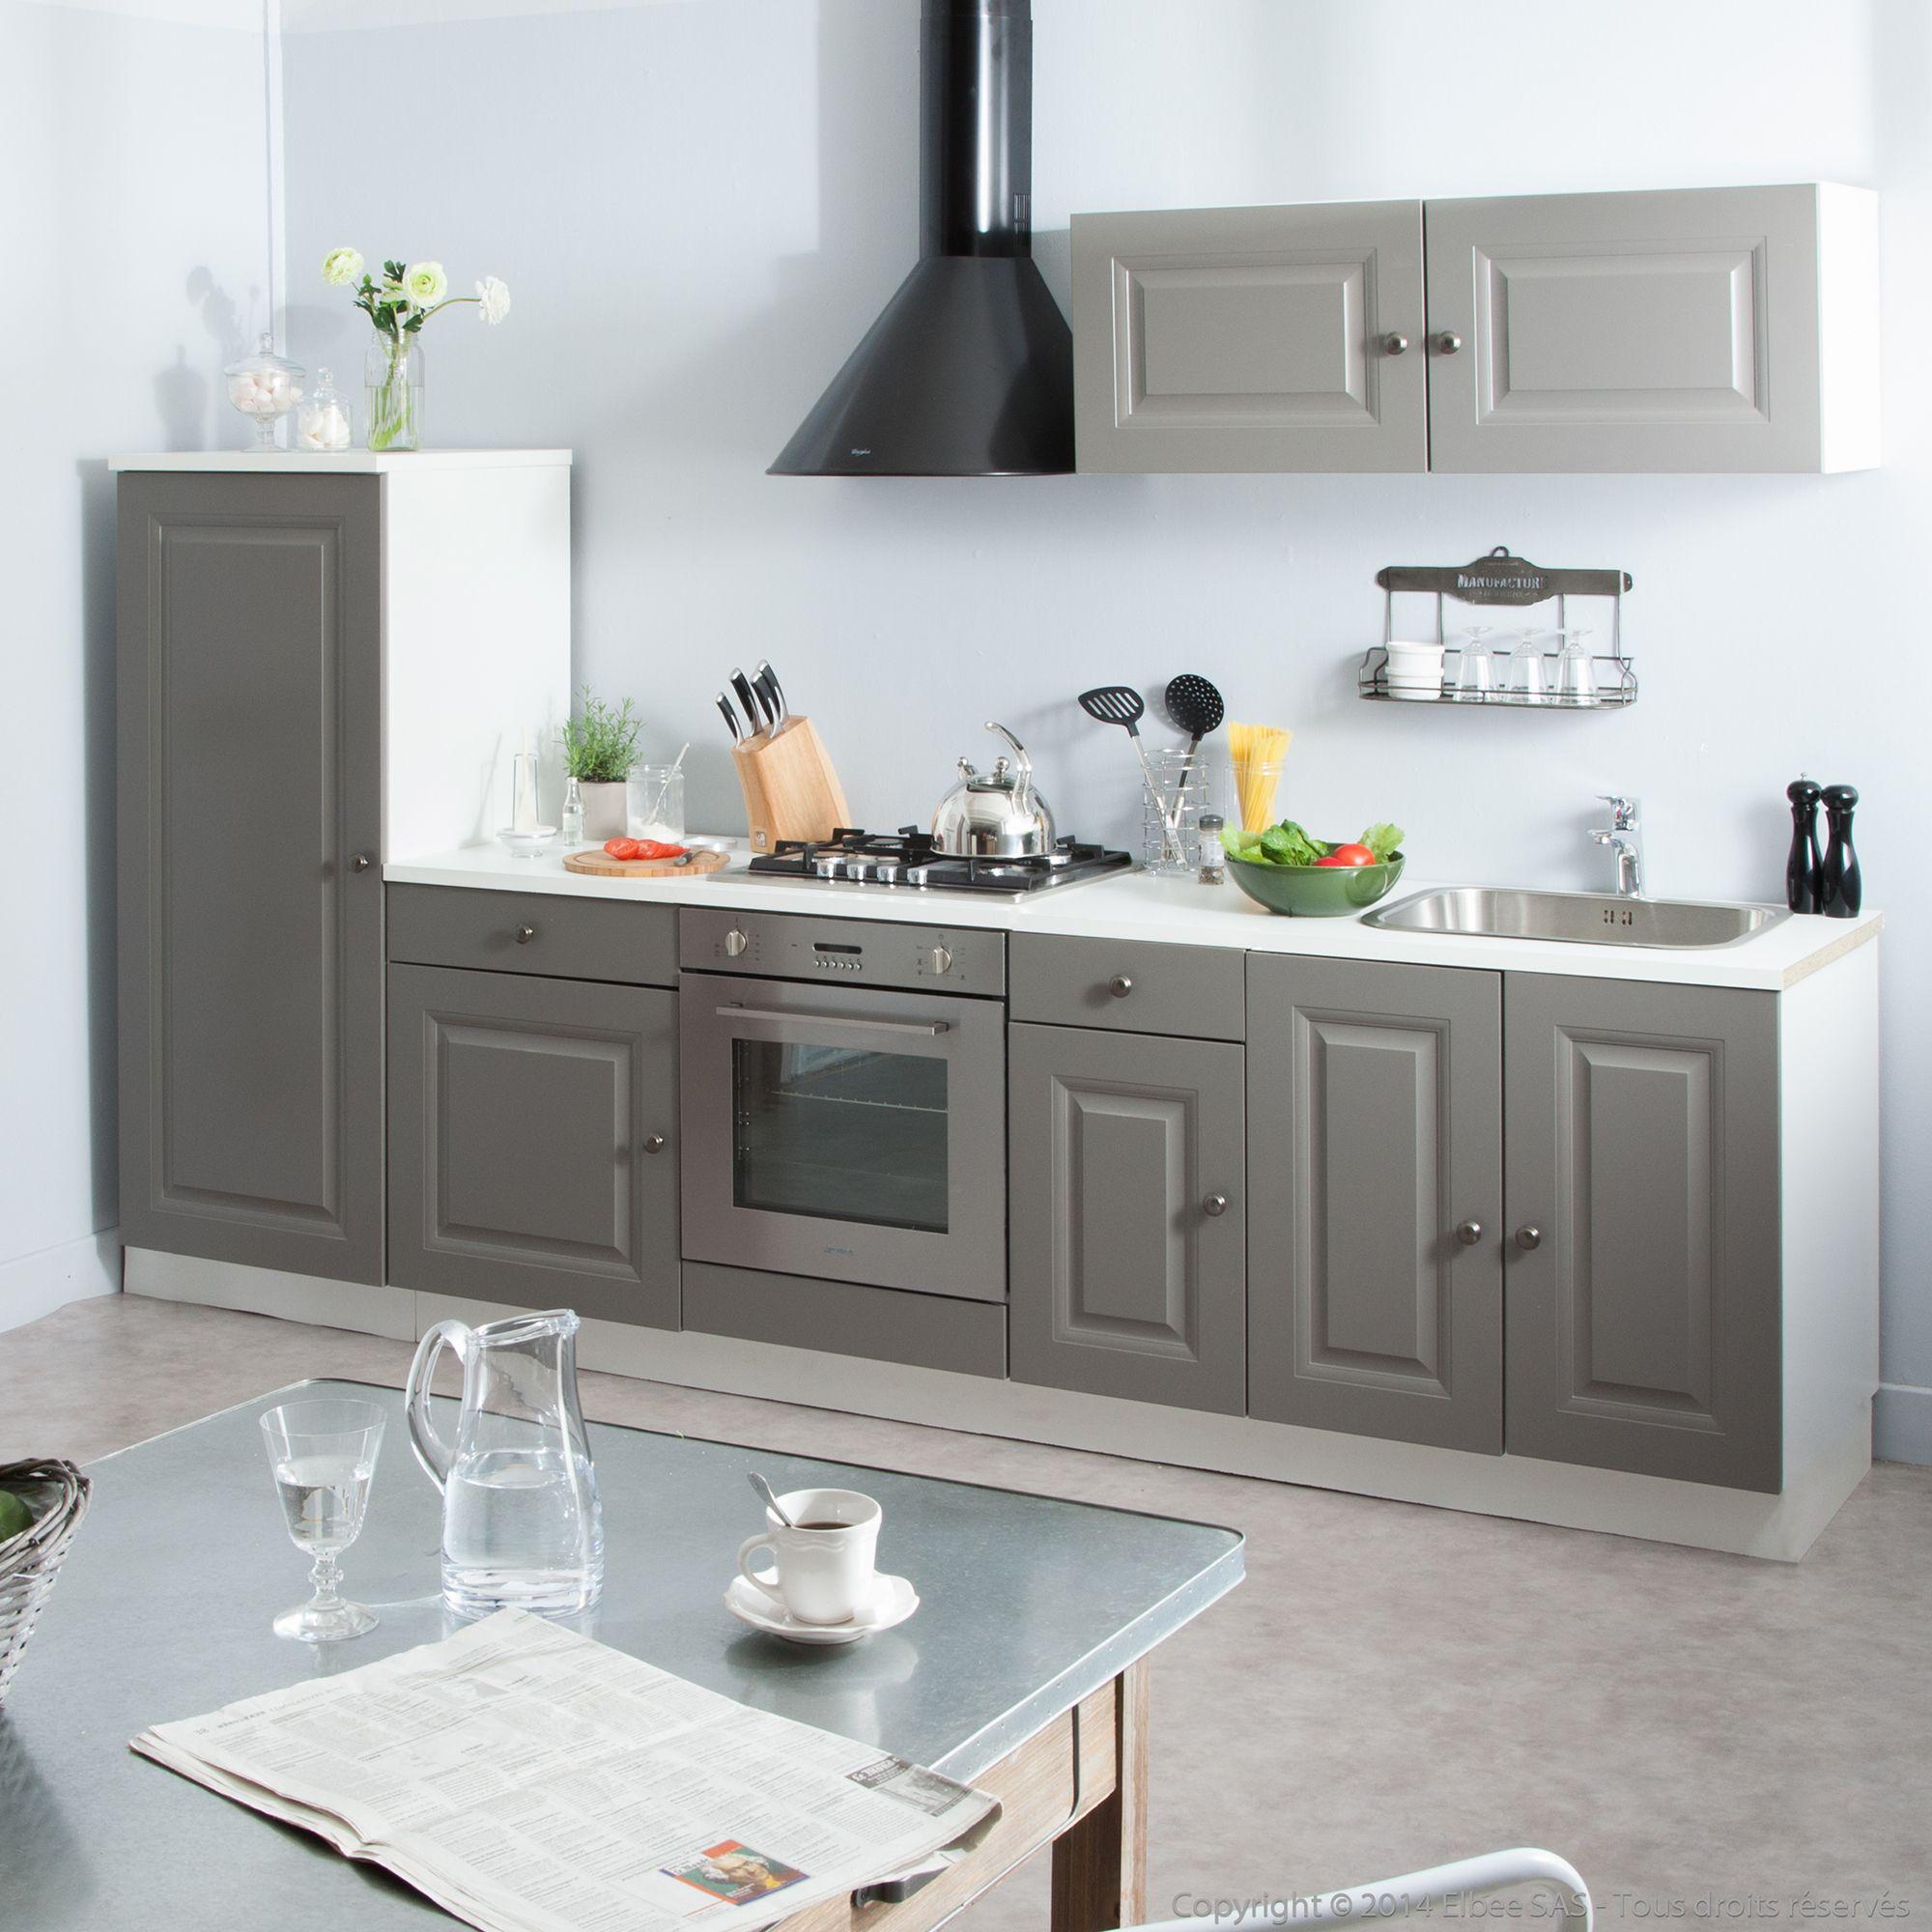 Cuisine am nag e balzac meuble de cuisine ikea meuble - Ikea meuble cuisine ...